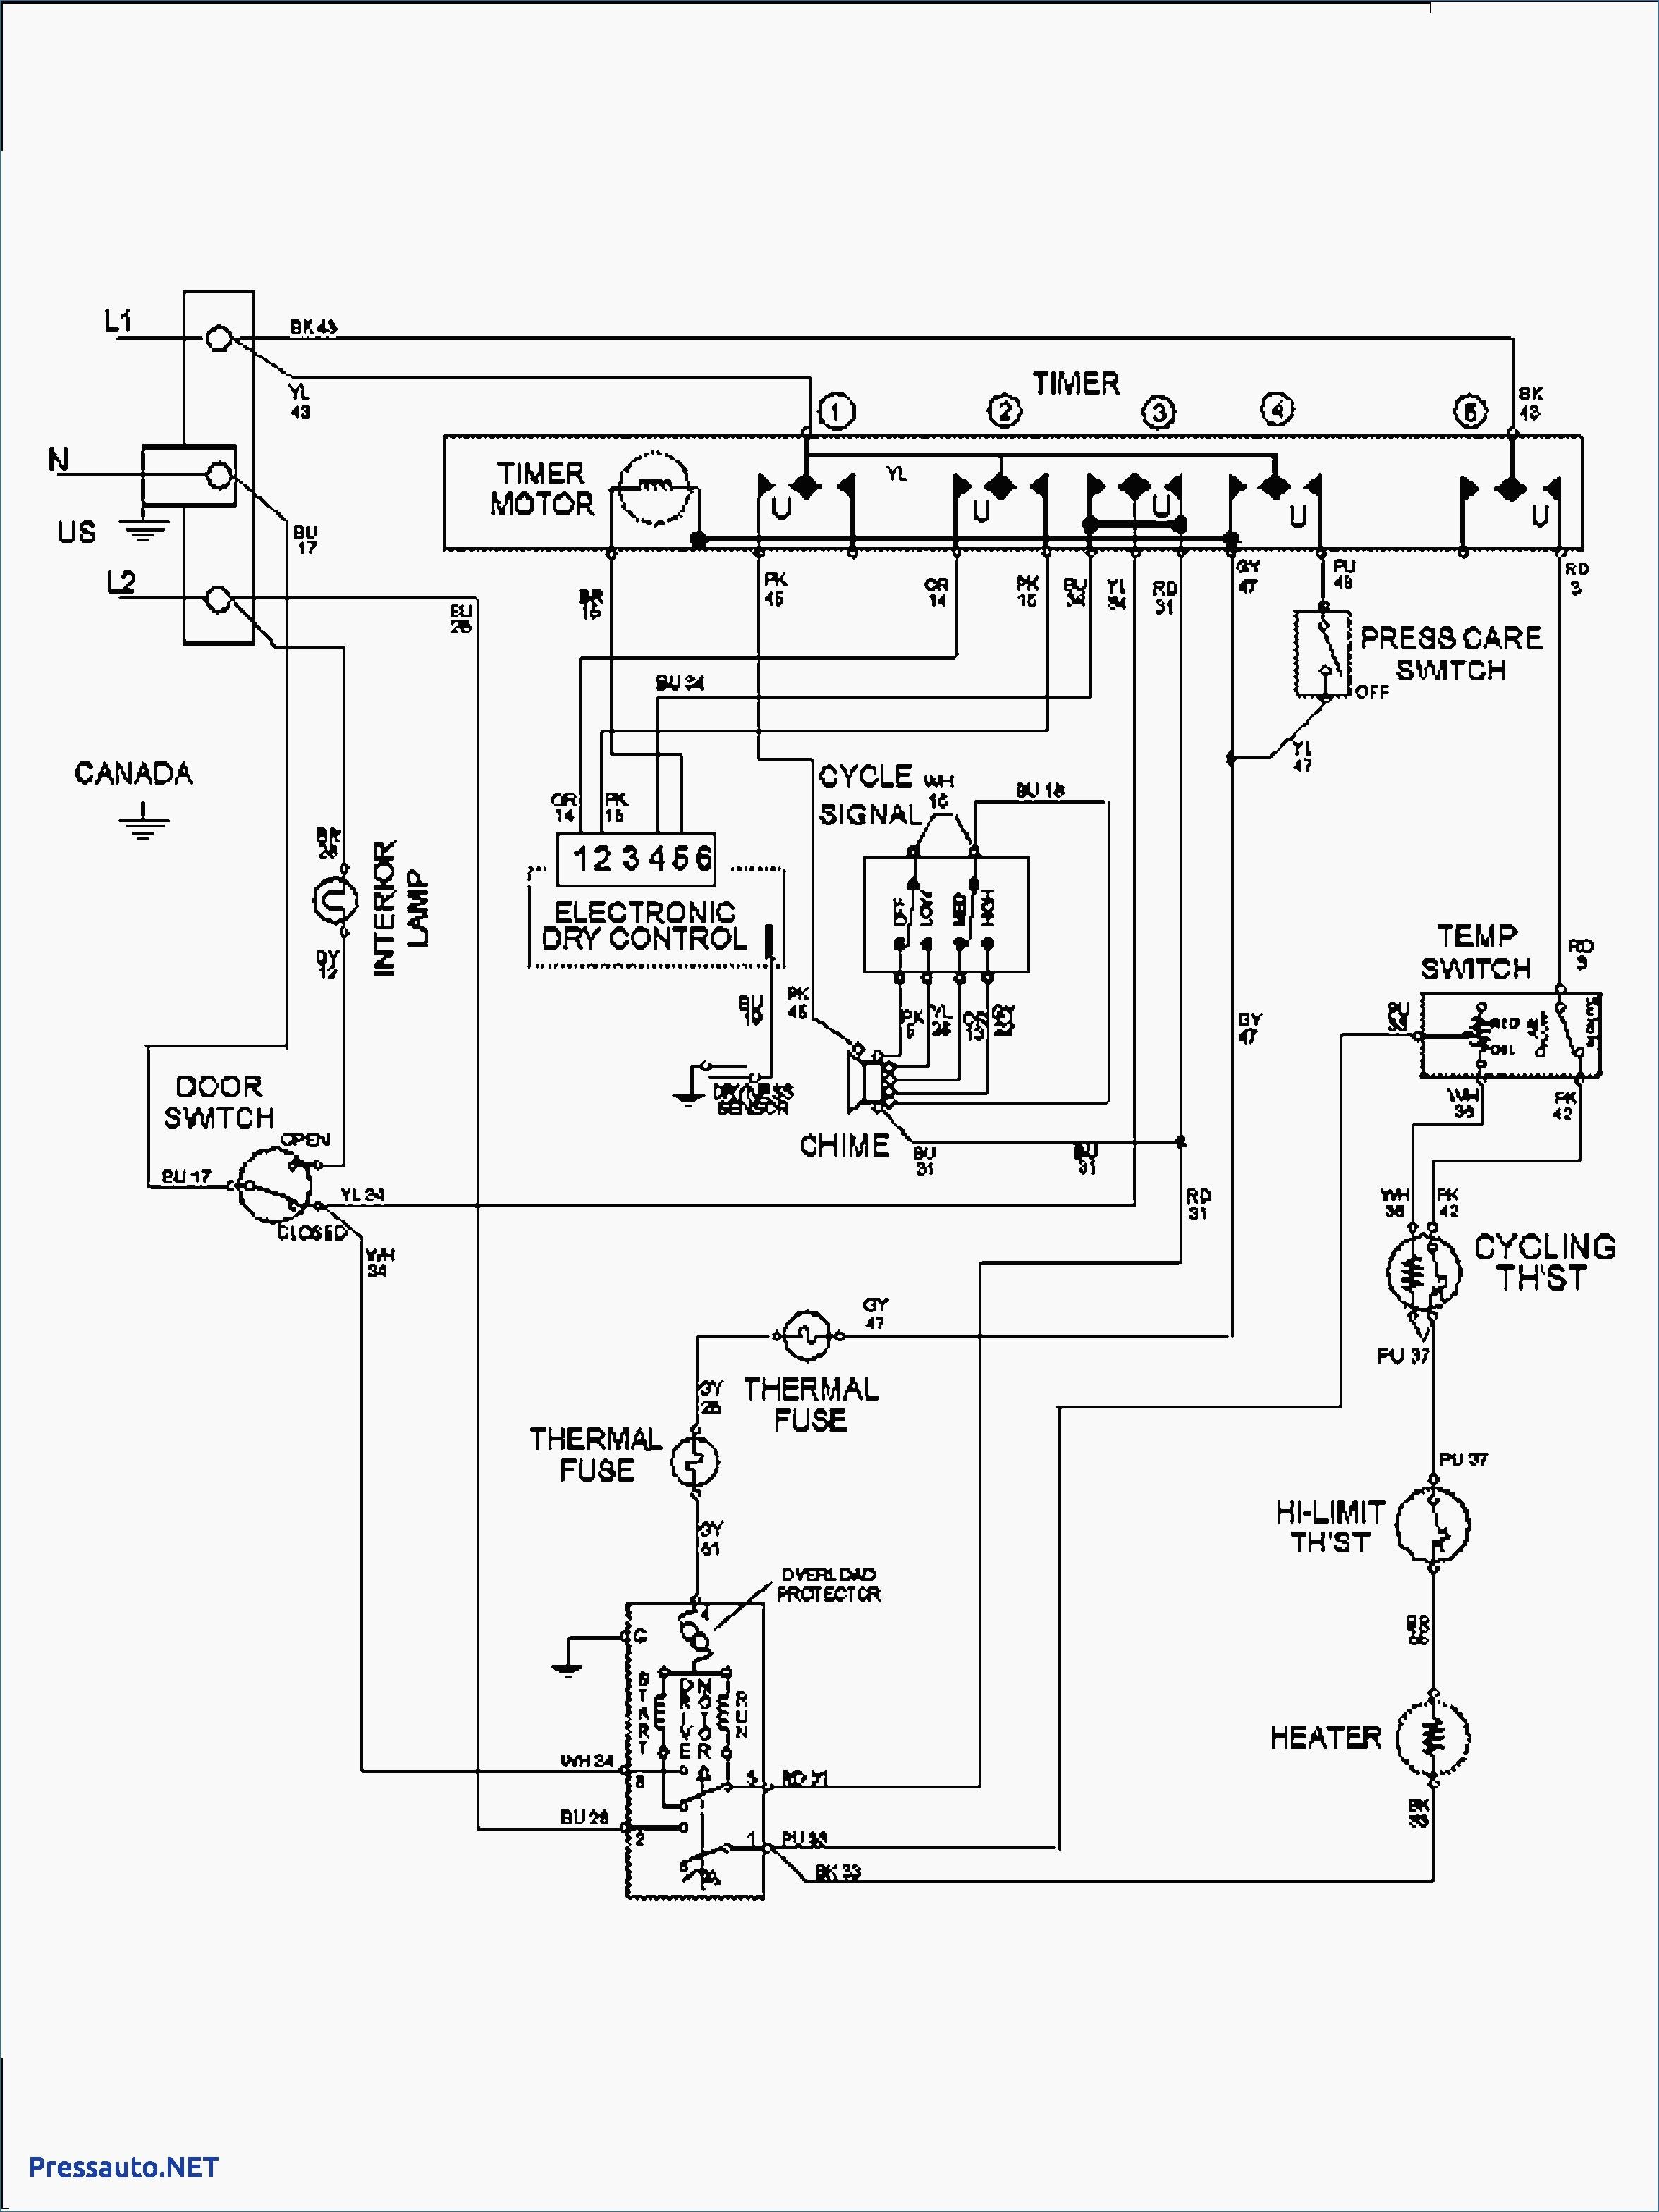 wascomat td75 wiring diagram wiring diagram rh w46 vom winnenthal de wascomat w74 wiring diagram wascomat w184 wiring diagram